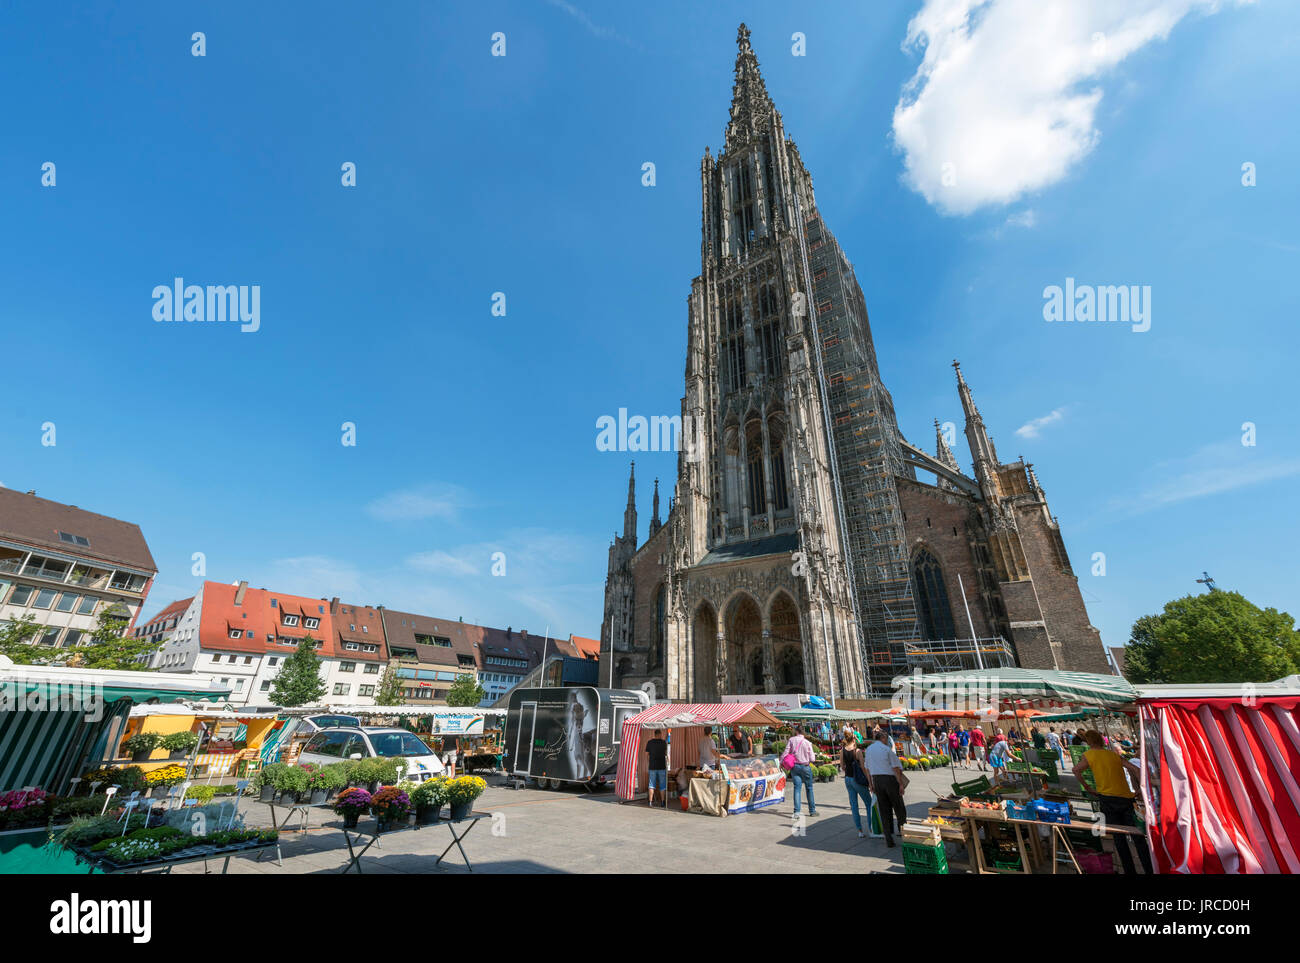 Market in front of the Münster, Münsterplatz, Ulm, Baden-Württemberg, Germany Stock Photo